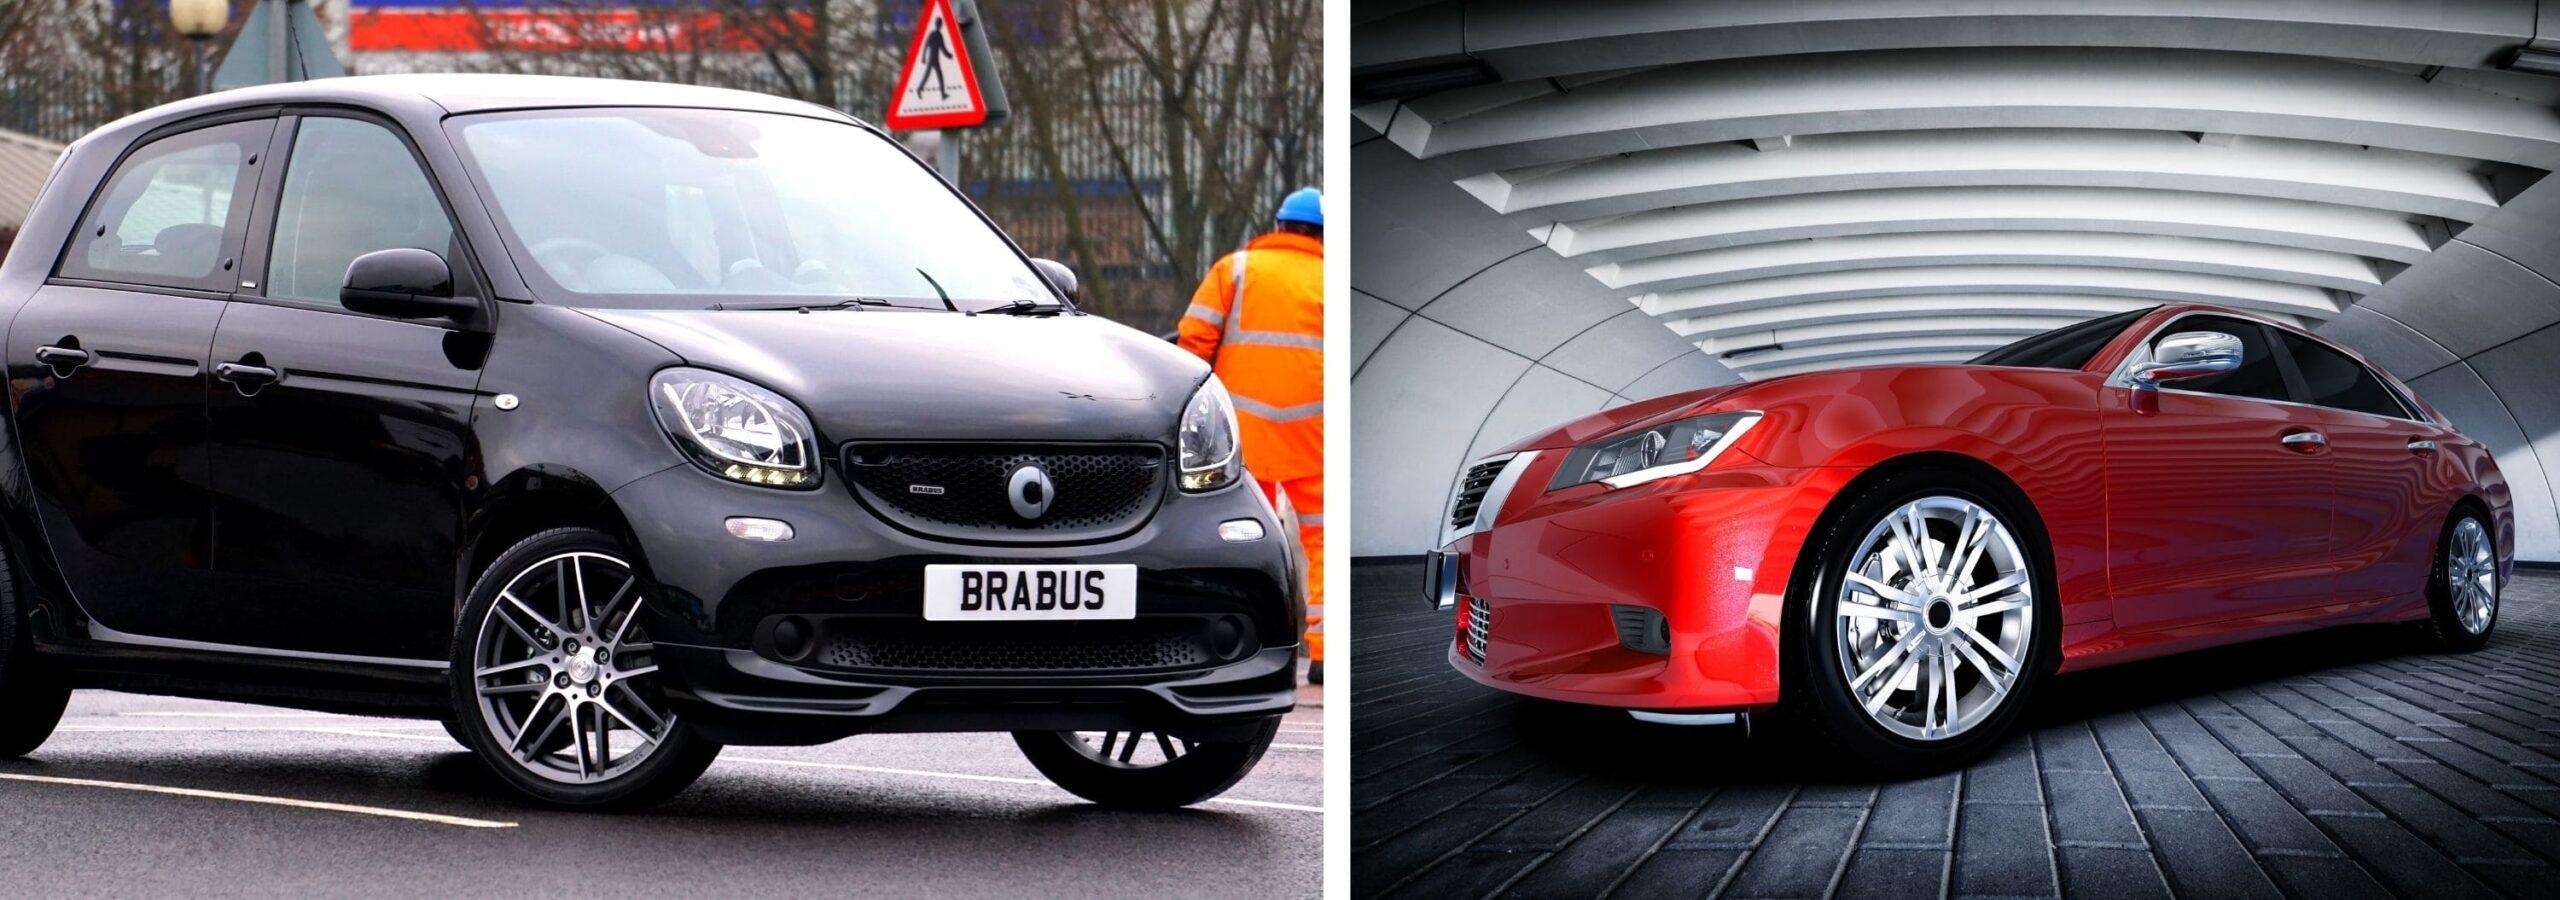 citadine-voiture-smart-voiture d'occasion-berline-acheter sa voiture d'occasion